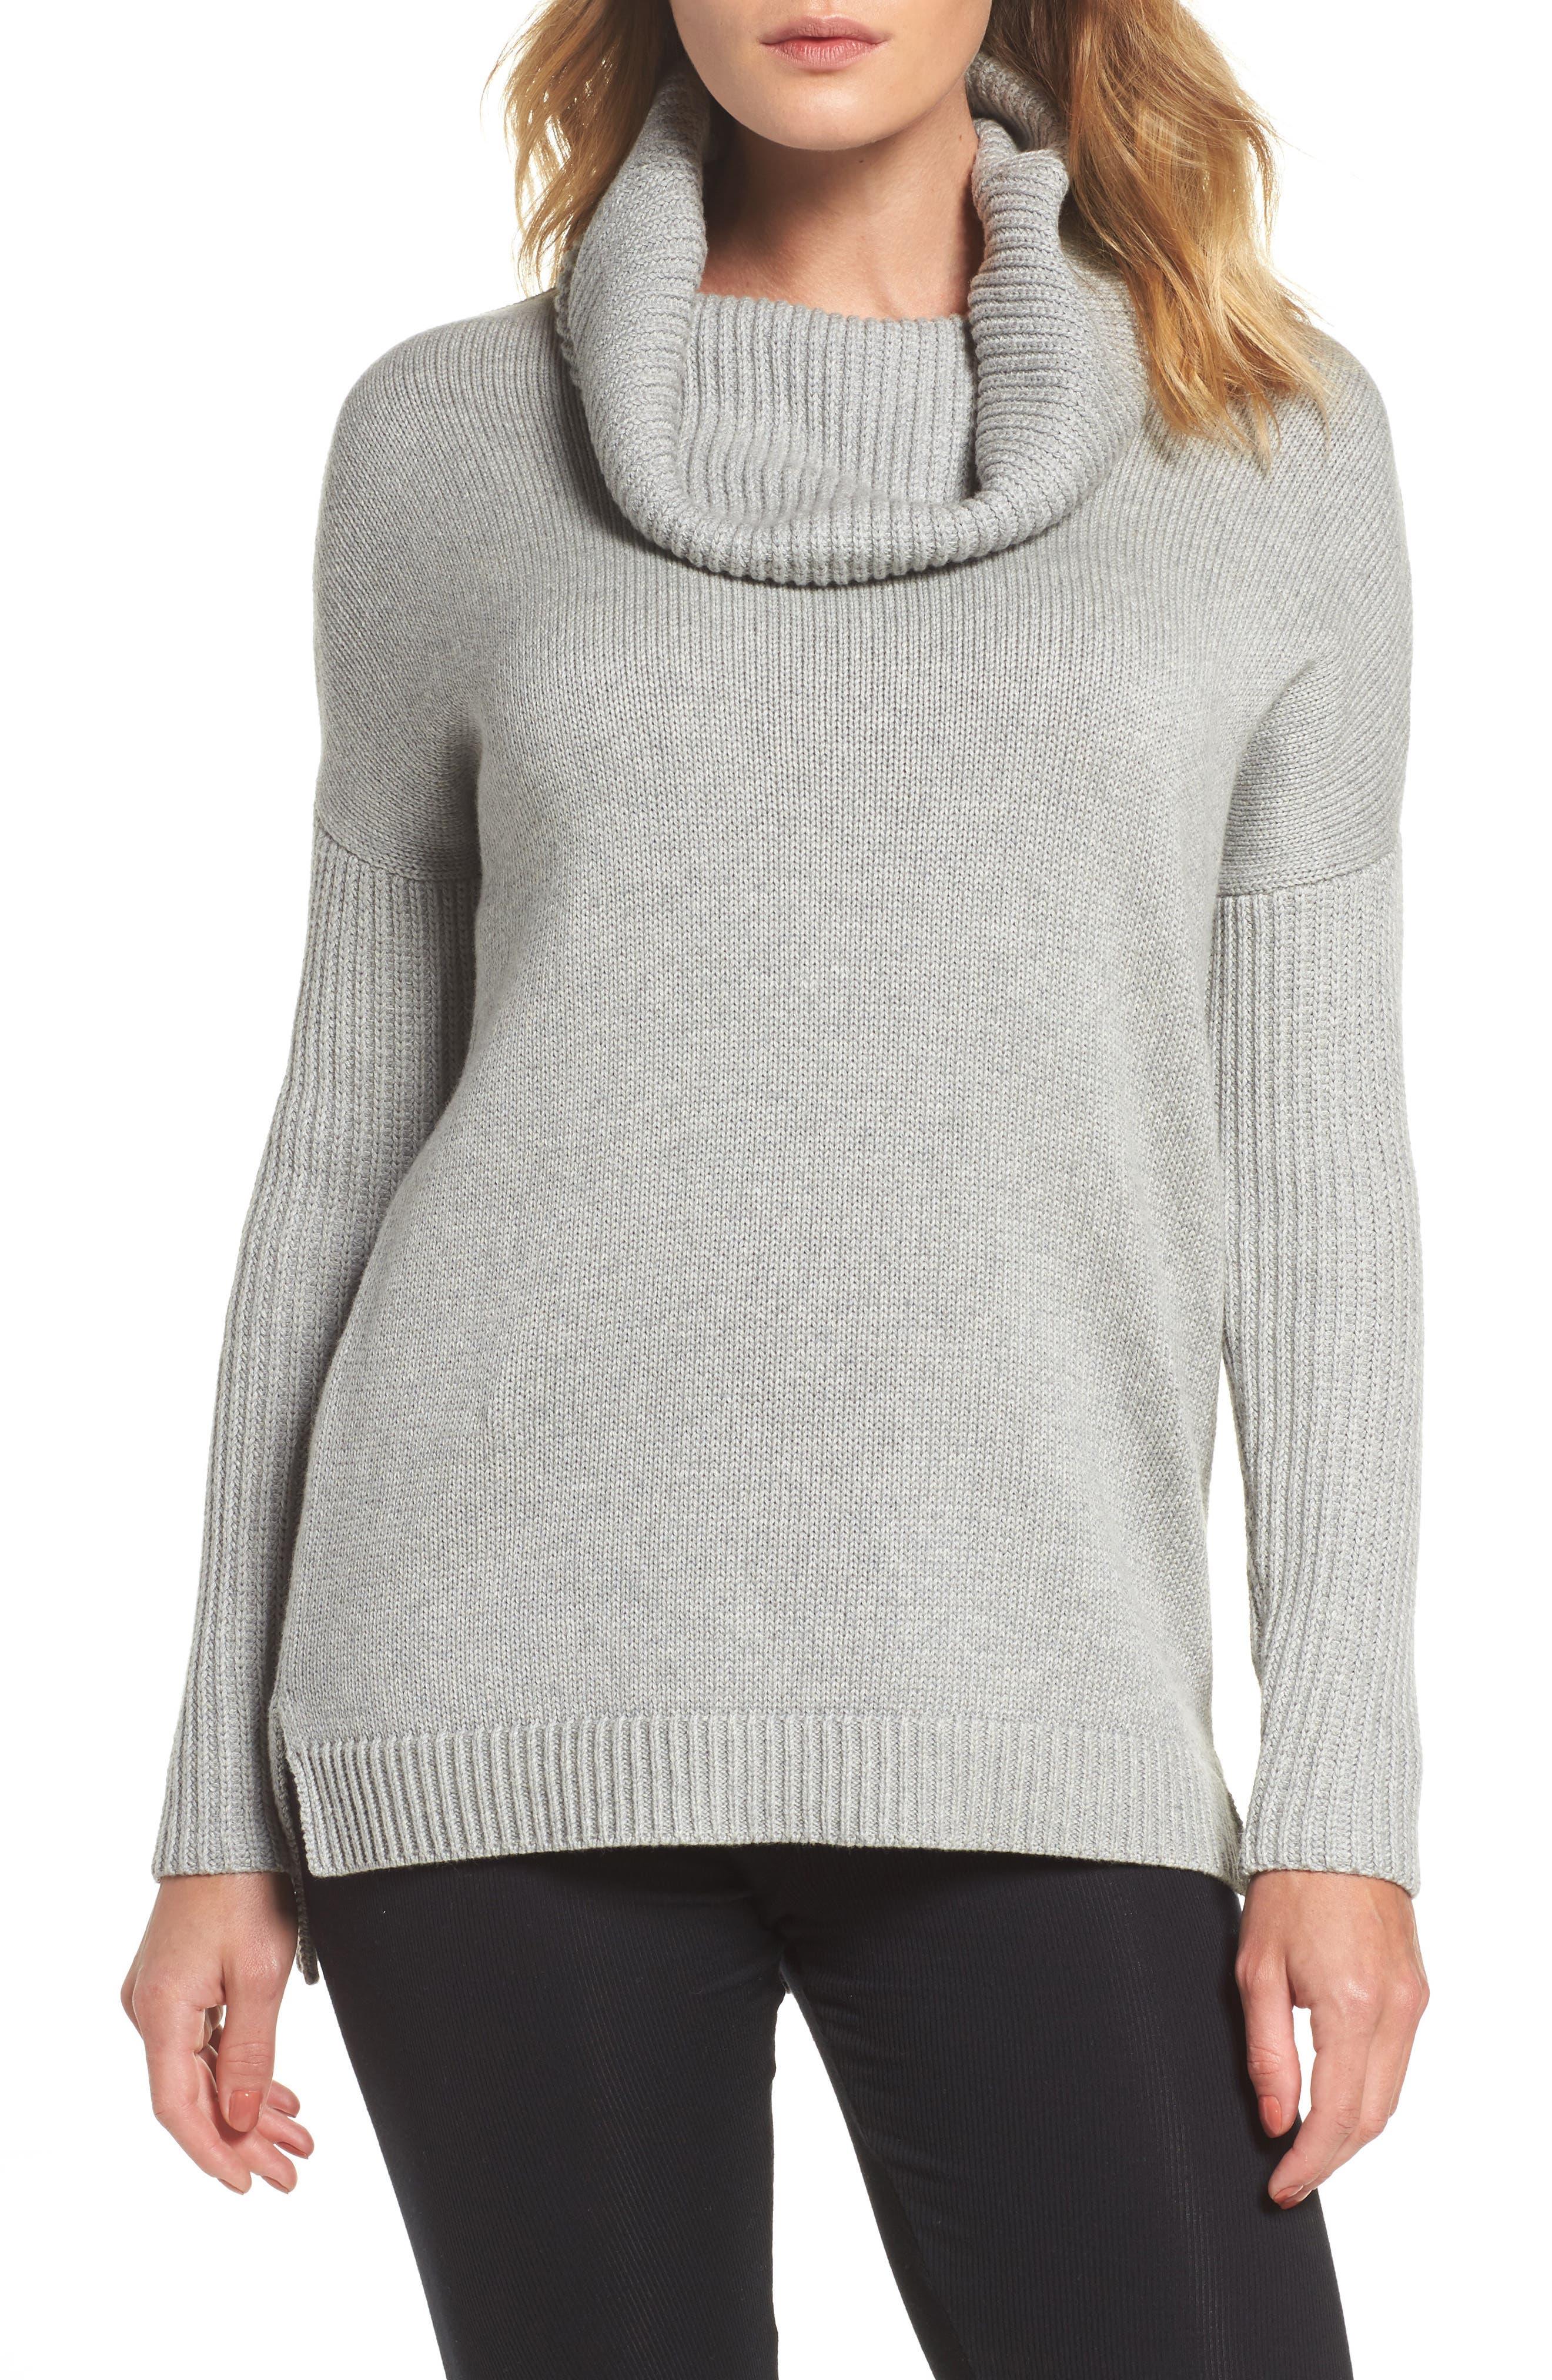 Main Image - UGG® Cowl Neck Tunic Sweater